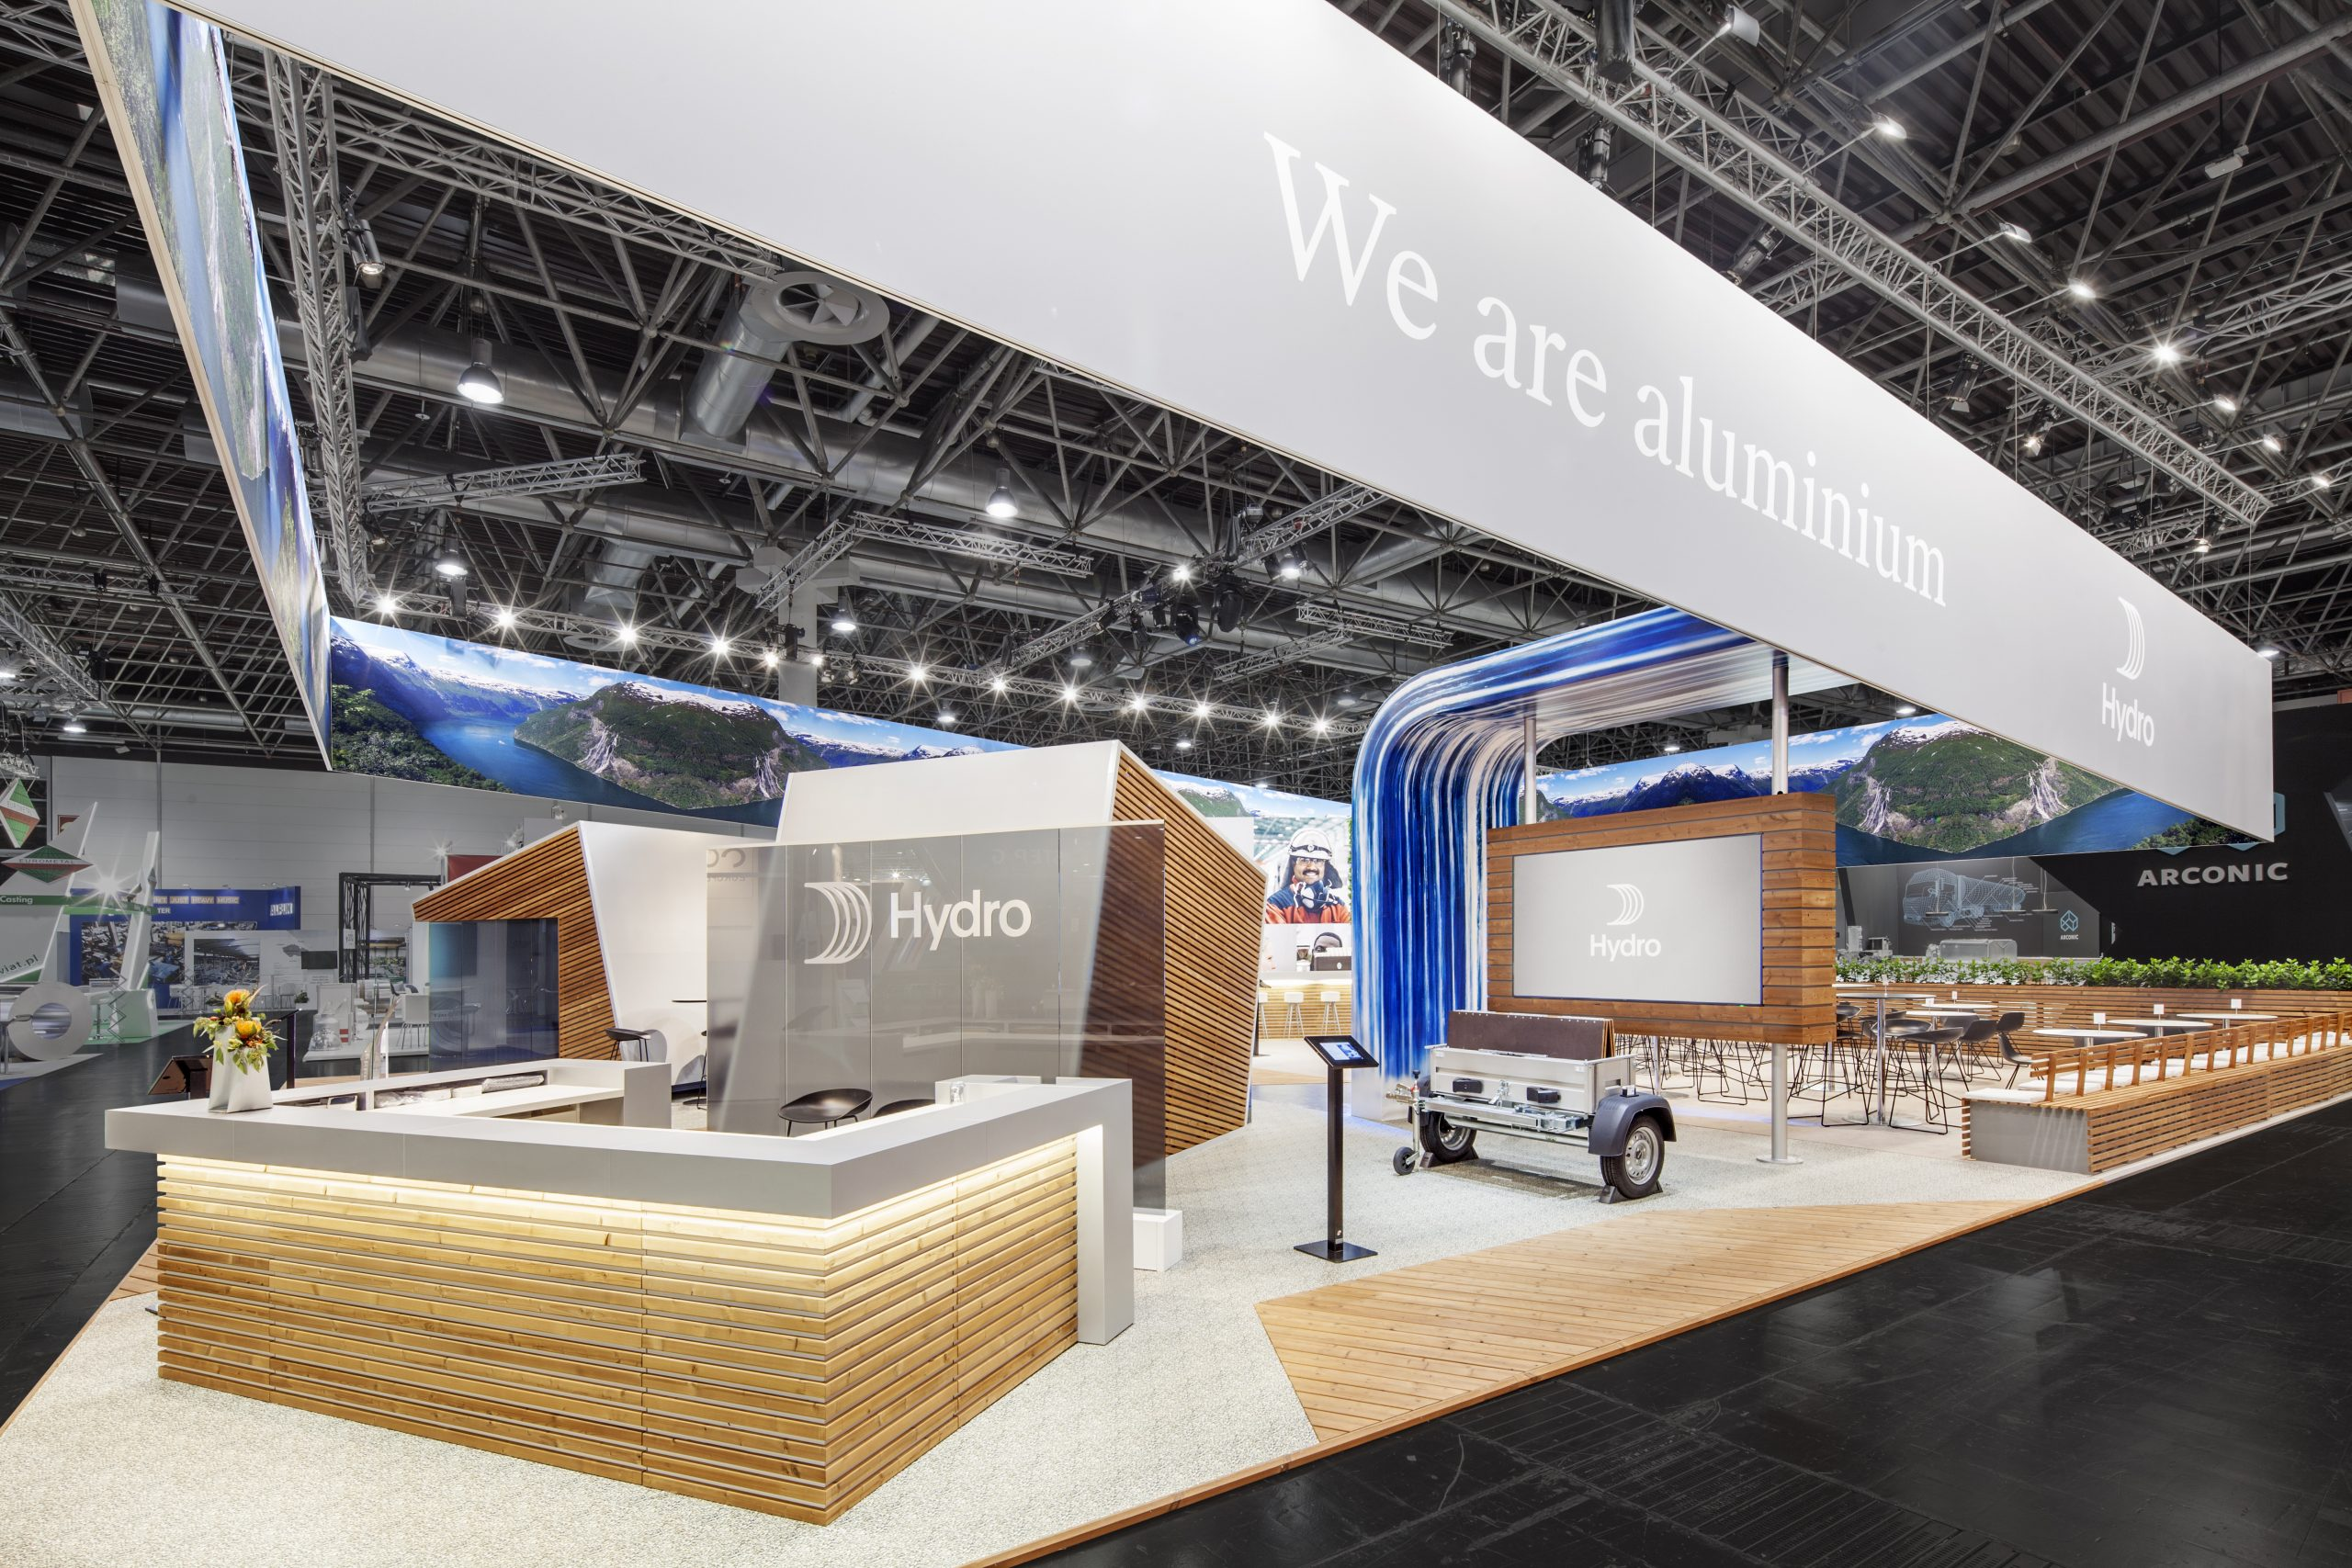 CAS Exhibition Partners - Hydro II - Aluminium 2018 - Düsseldorf - Standbouwfotografie #9882